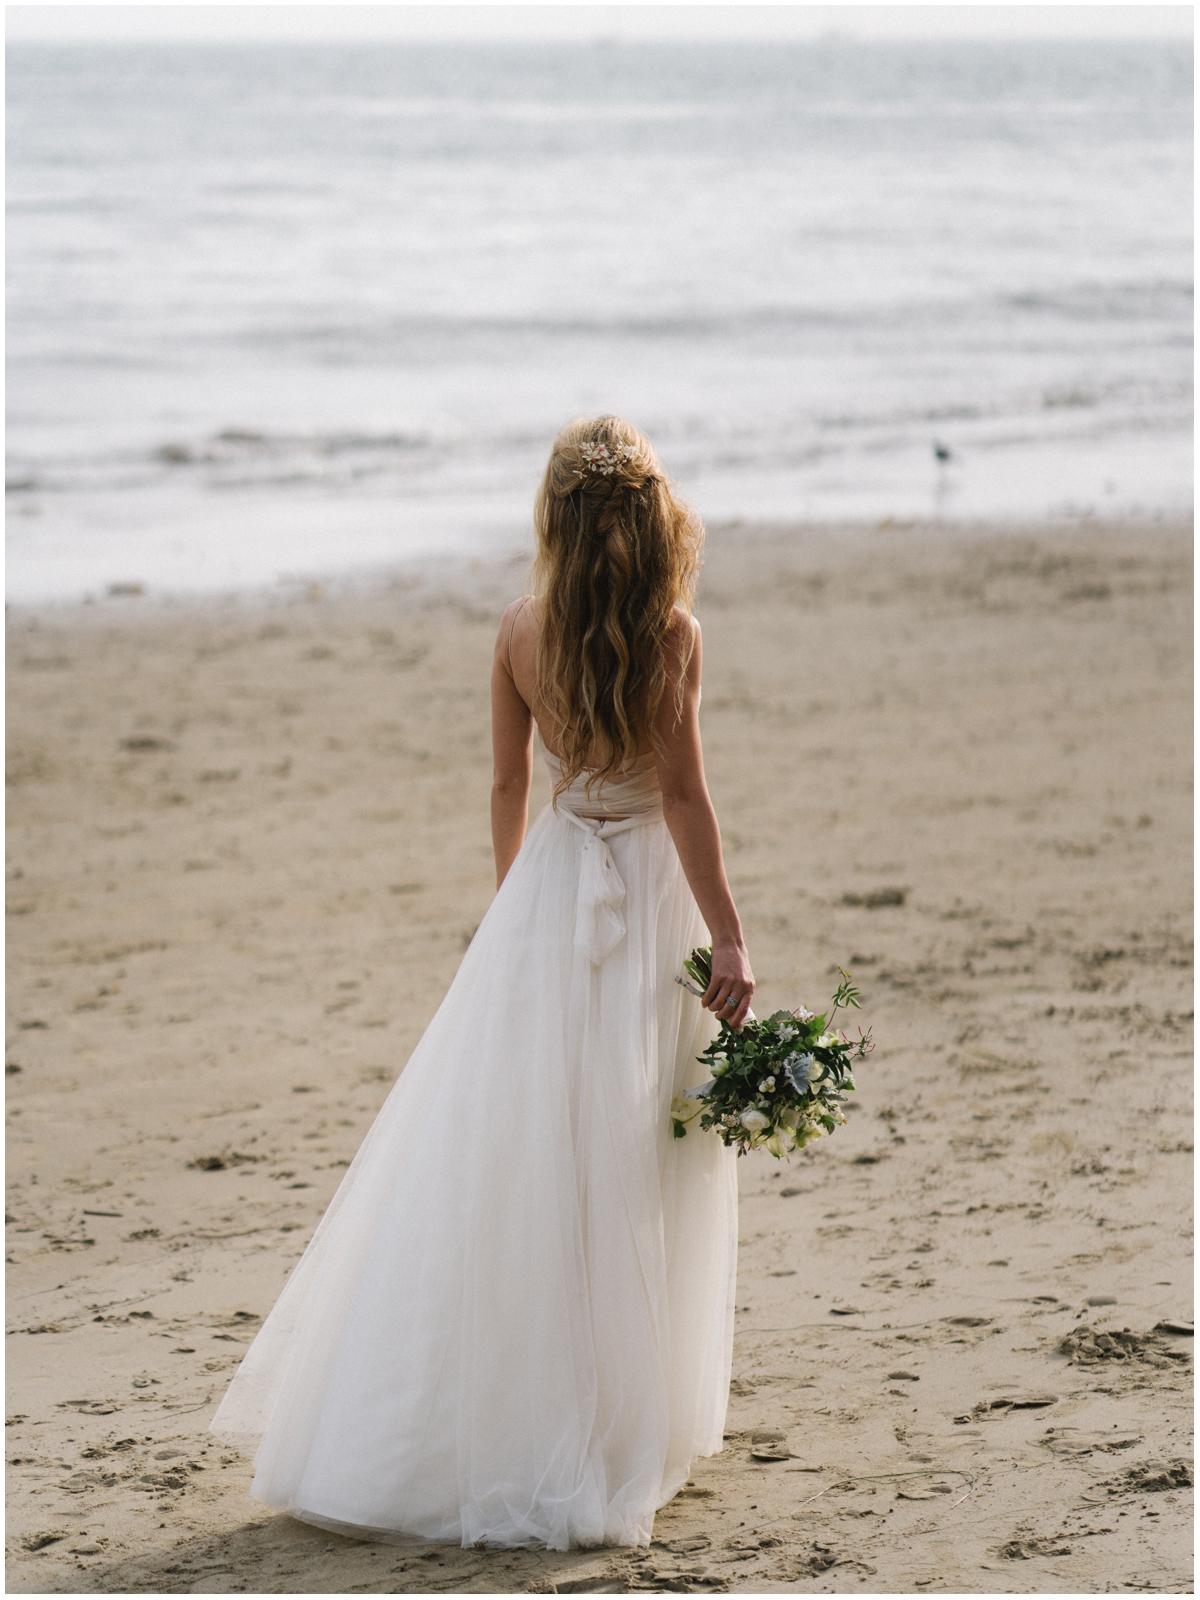 Santa Babara Elopement Wedding Photographer - Pinnel Photography-01-16.jpg